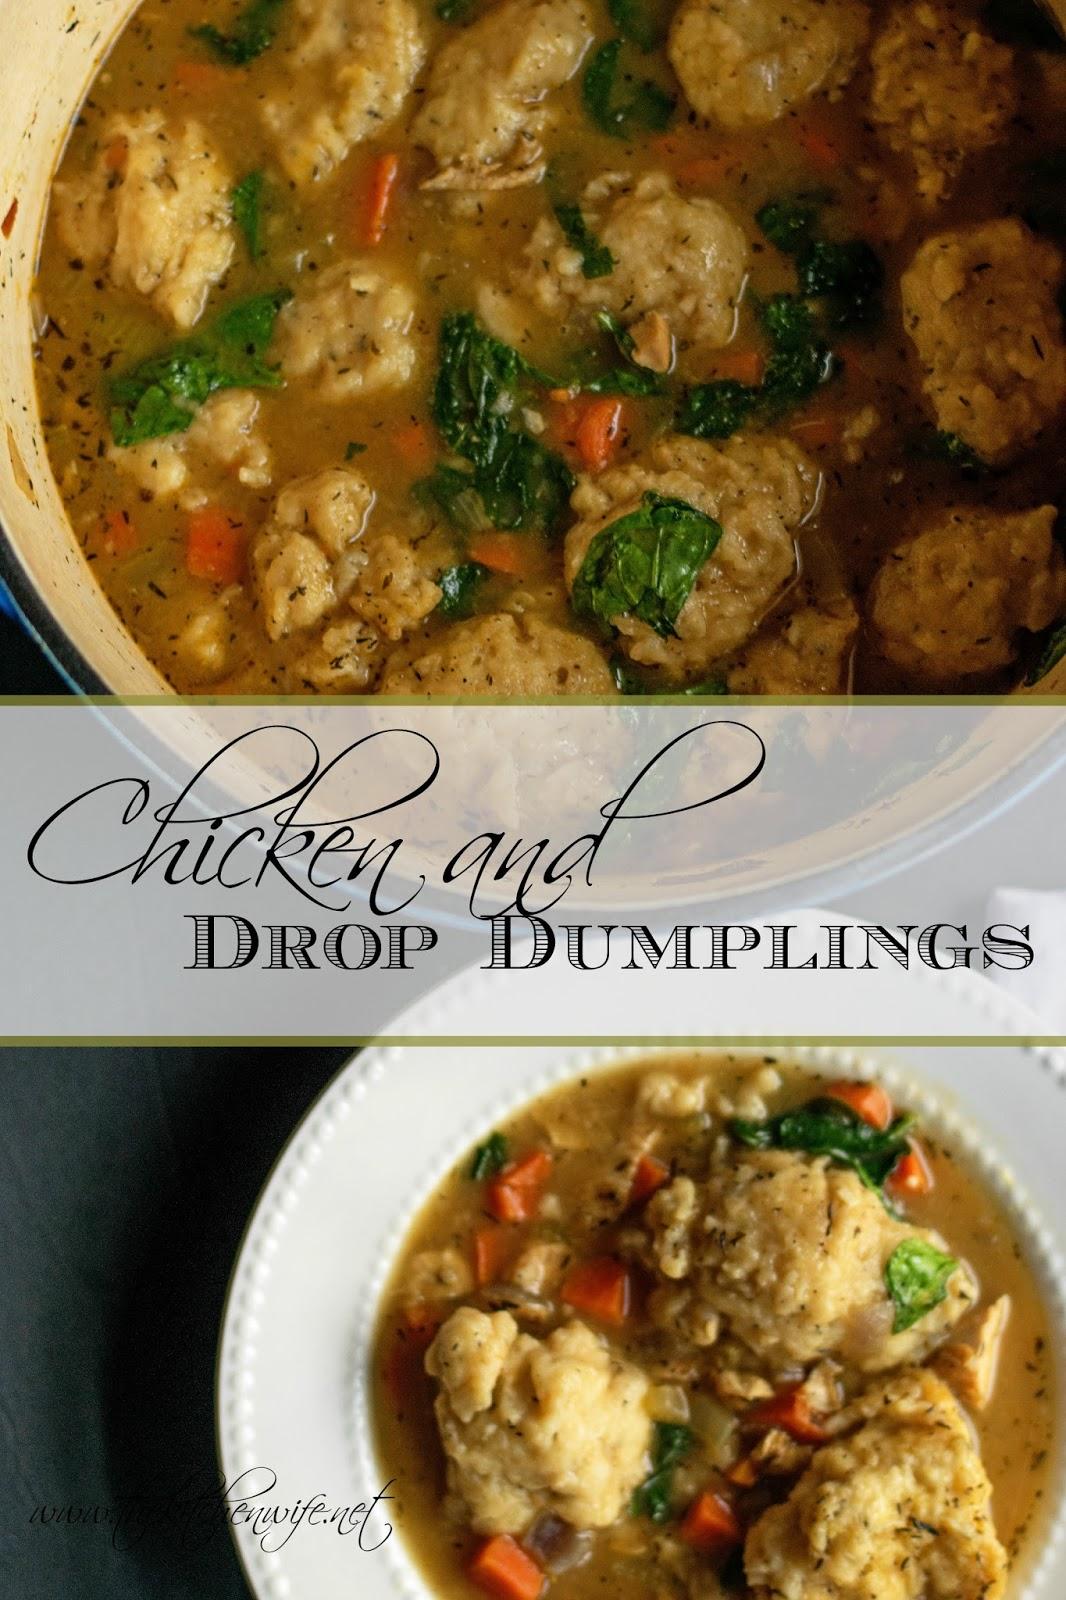 recipe: chicken and drop dumplings from scratch [16]